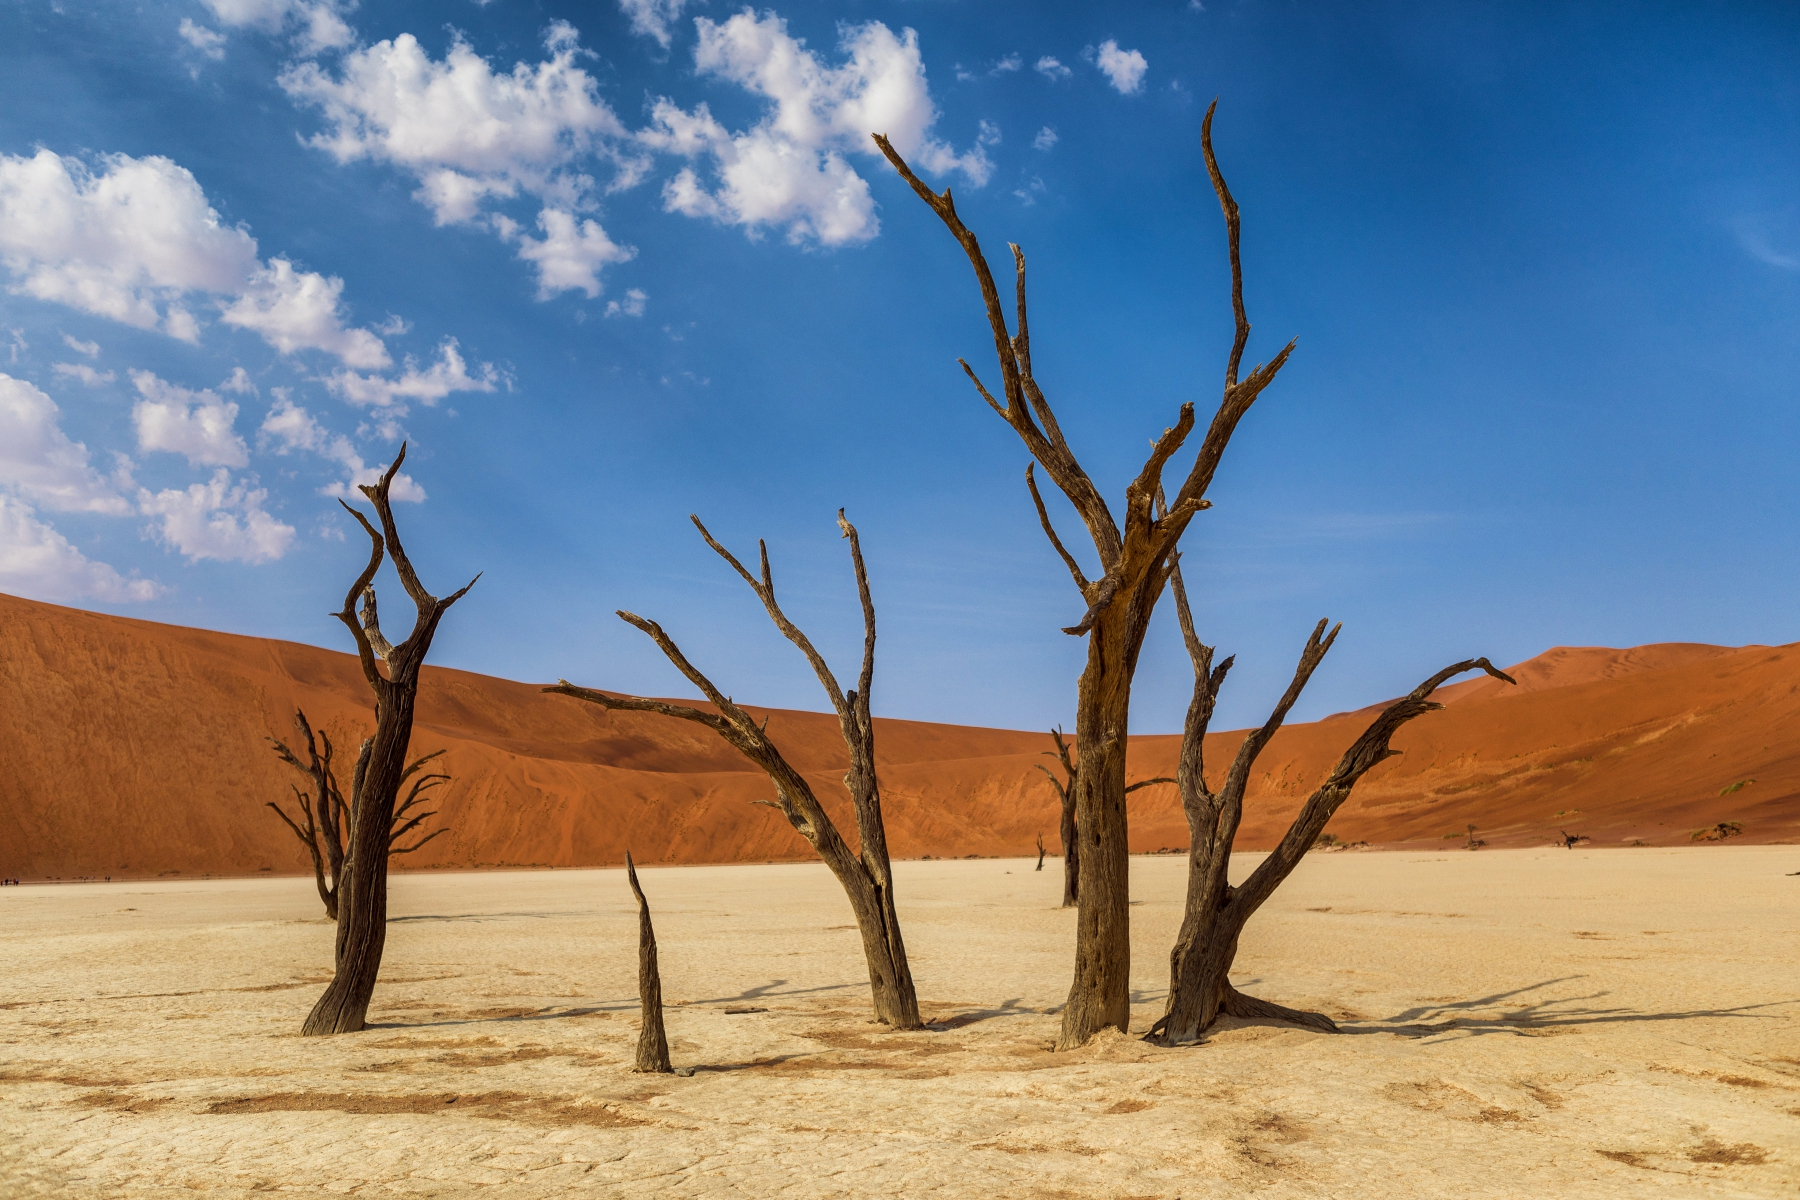 pierde desert de desert